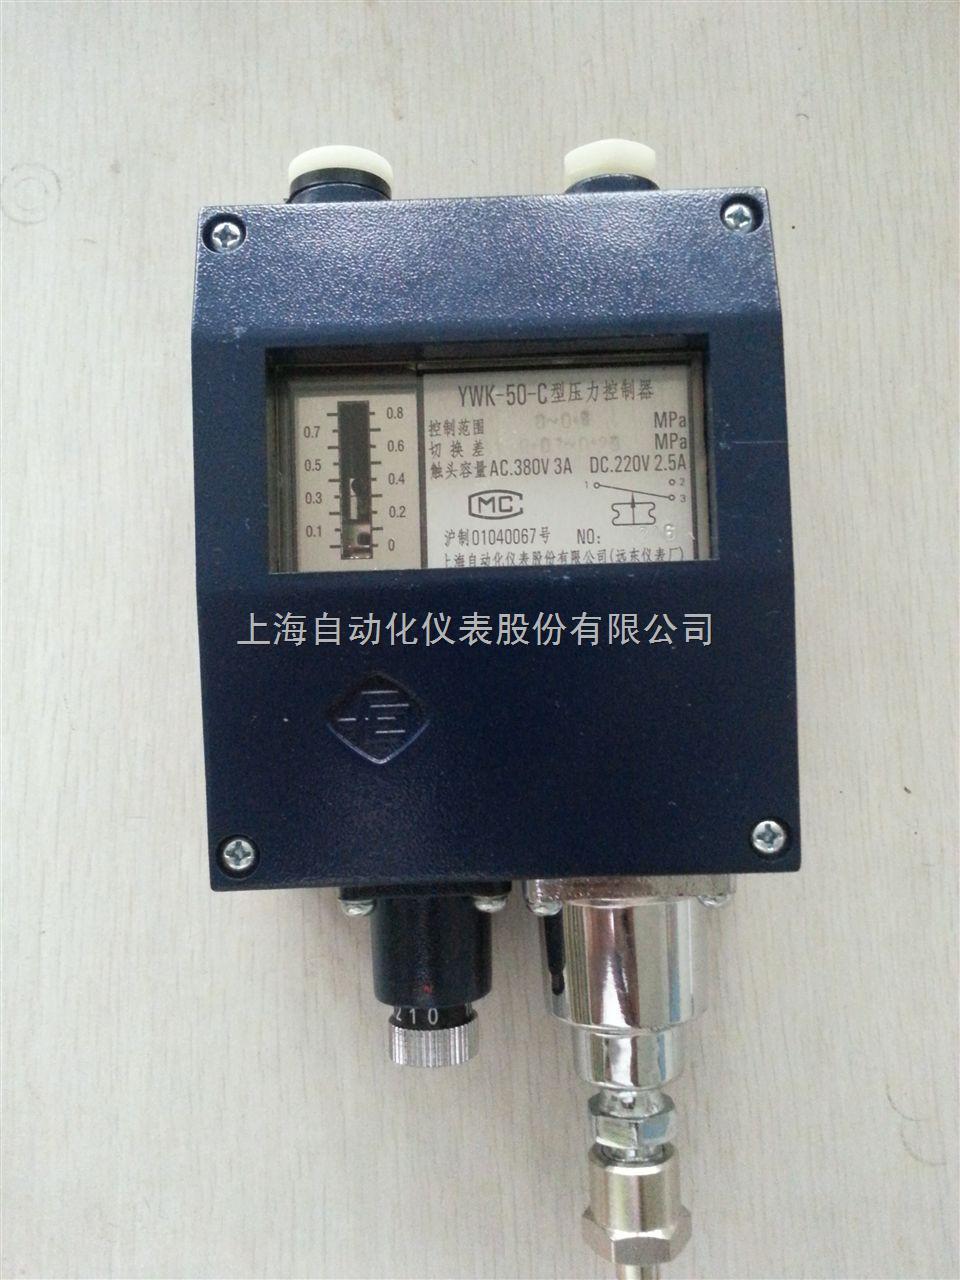 YWK-50-C-YWK-50-C船用压力控制器-上海远东仪表厂